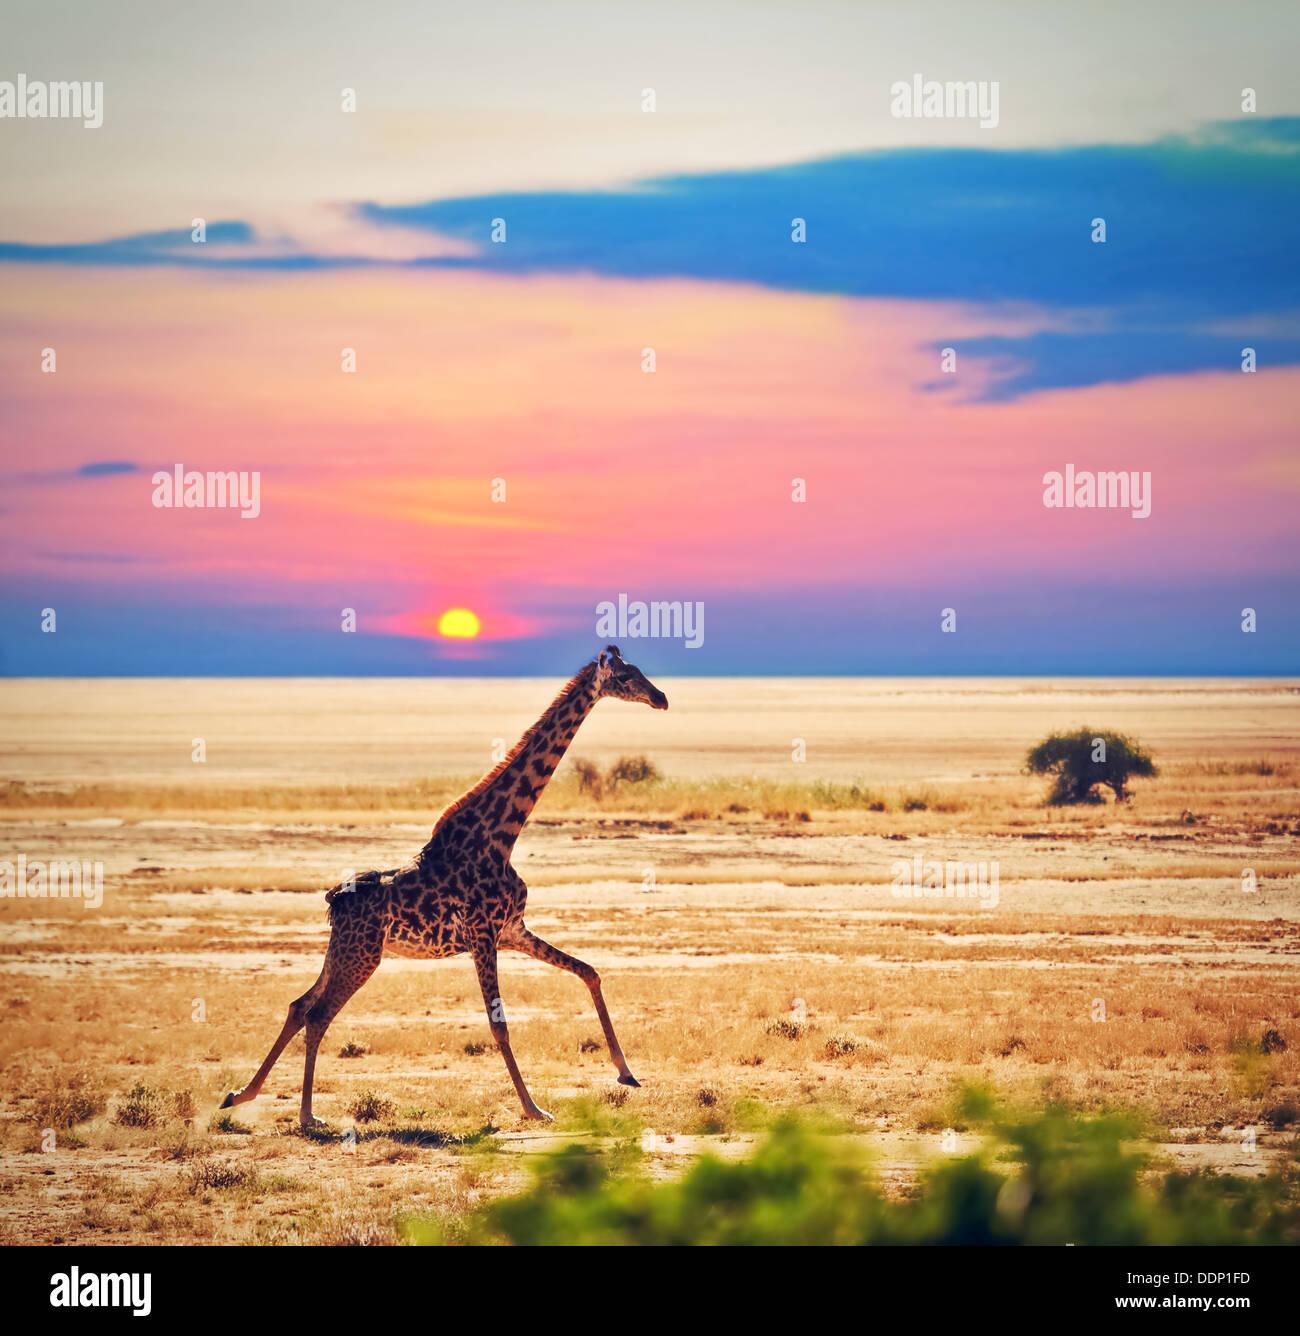 Tierwelt - Giraffe läuft auf der Savanne bei Sonnenuntergang. Safari im Amboseli Nationalpark, Kenia, Afrika Stockbild